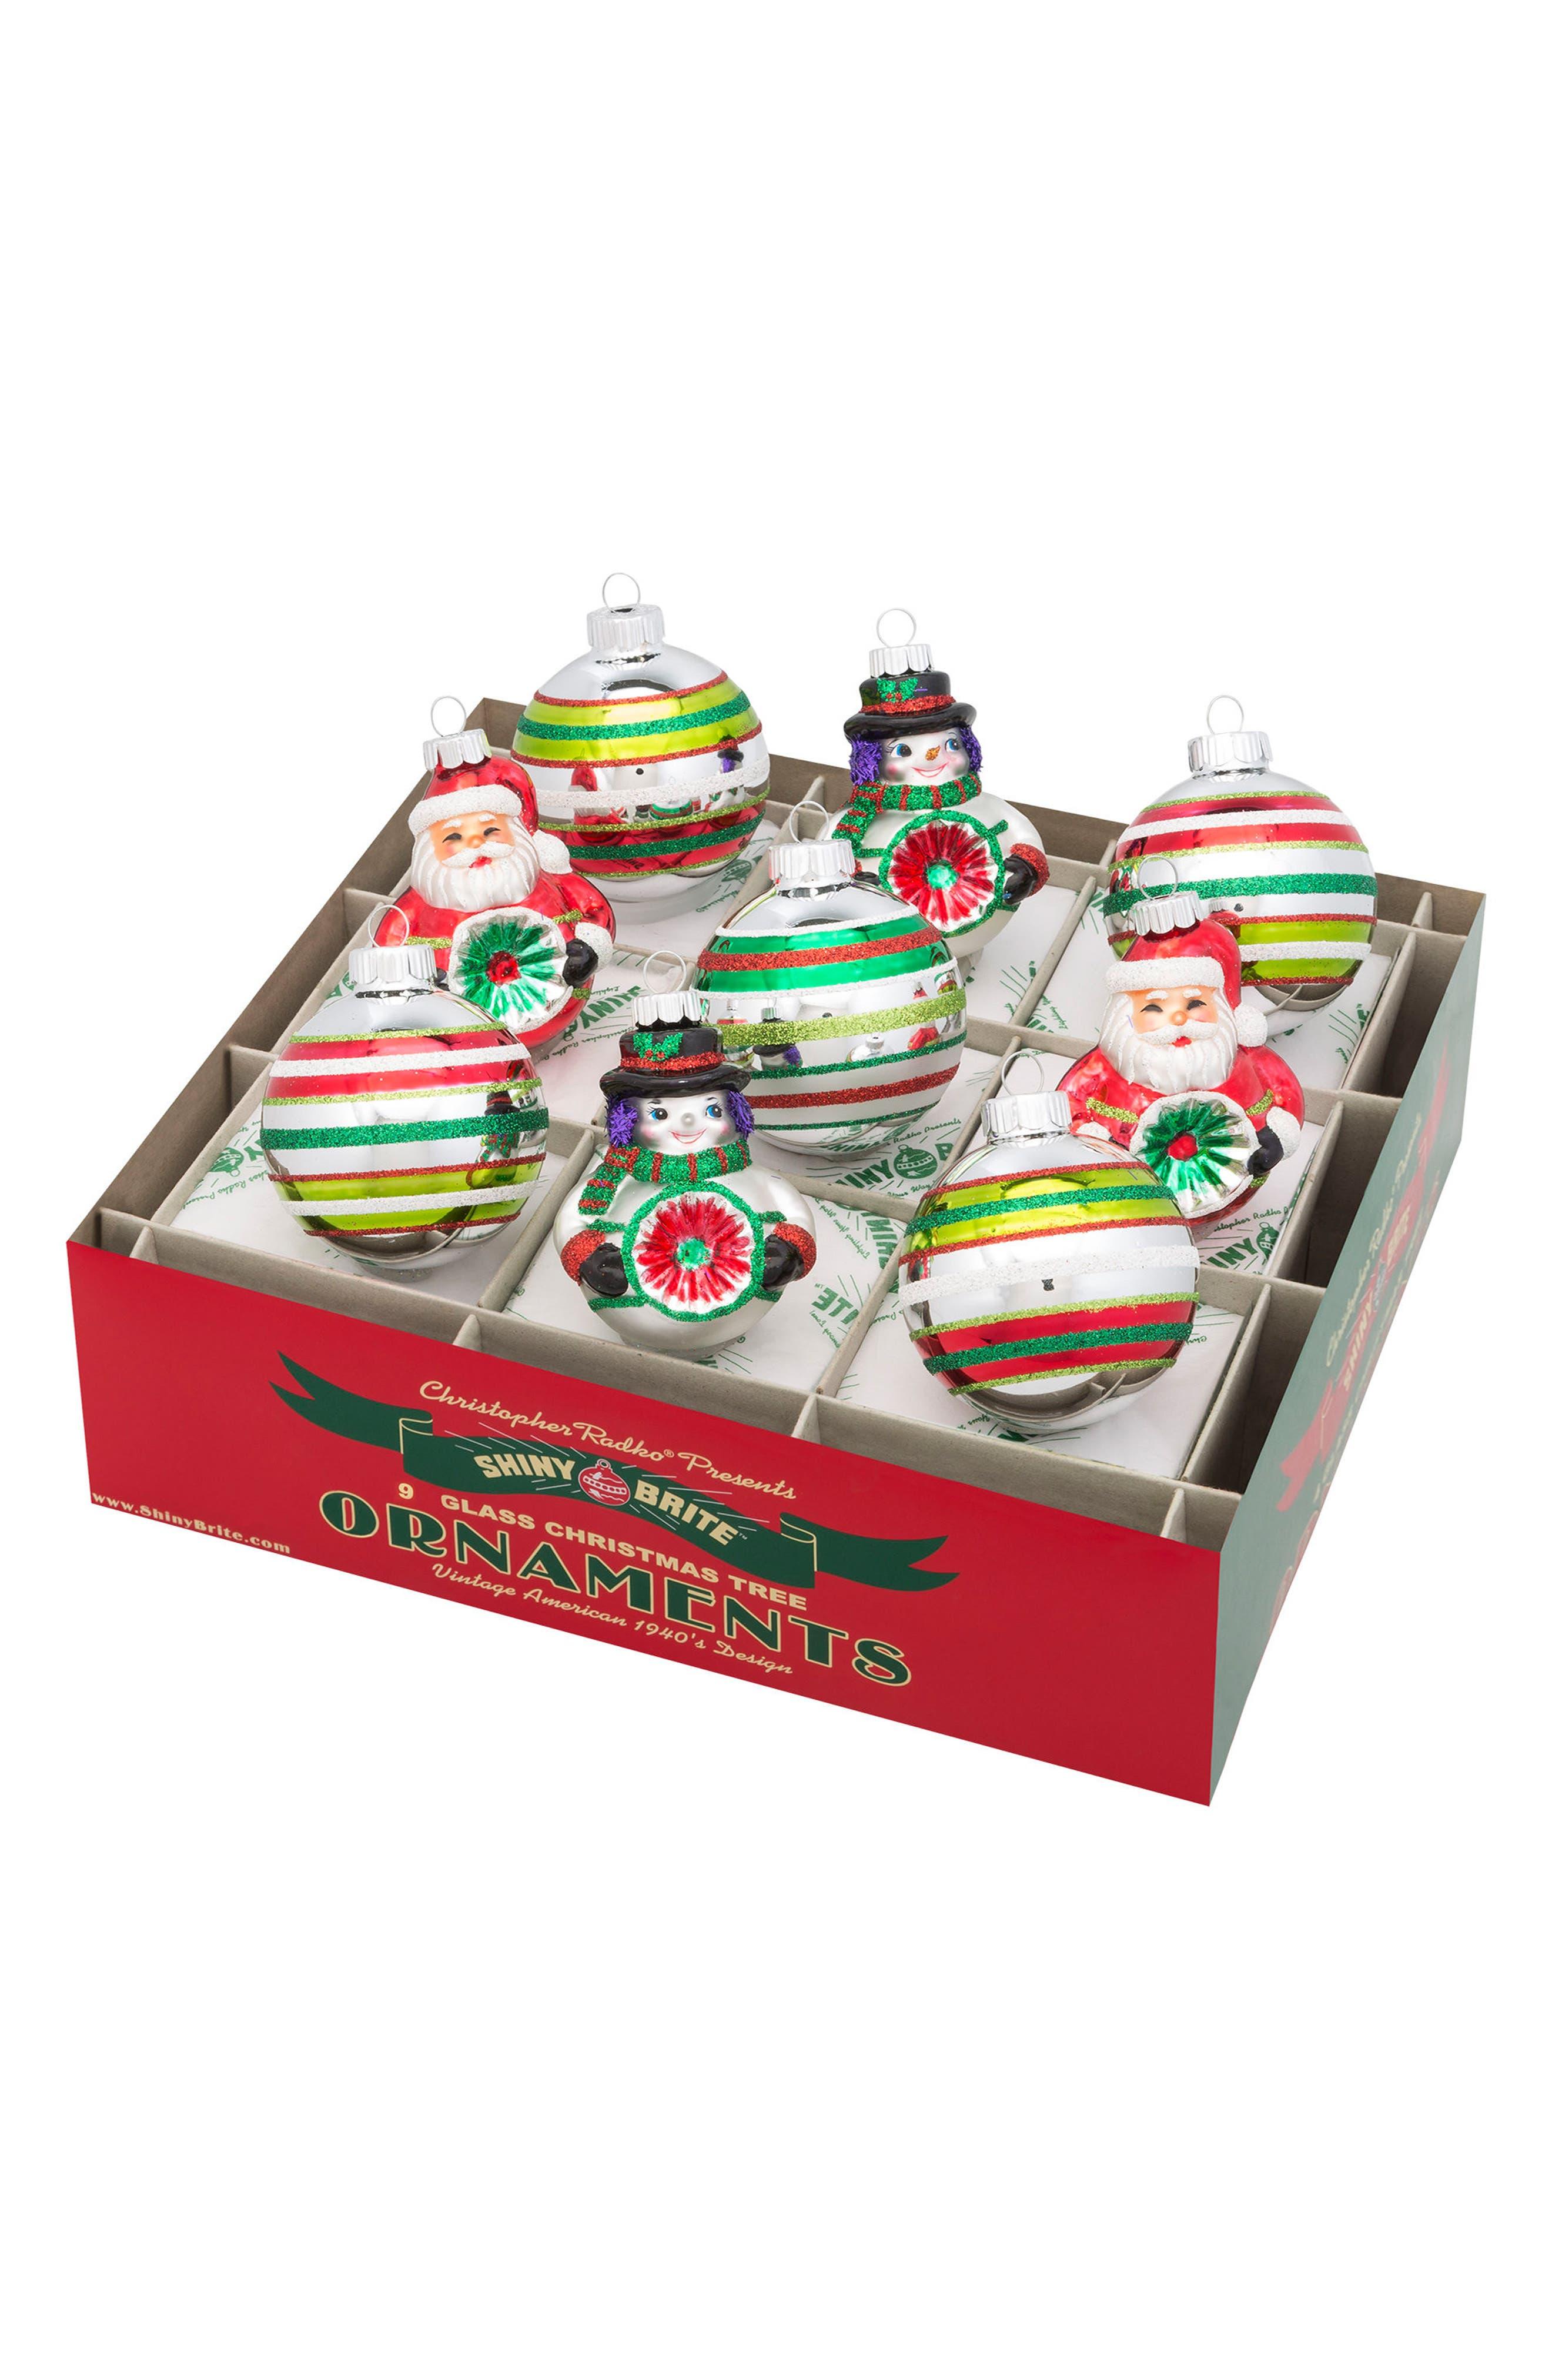 Alternate Image 1 Selected - Christopher Radko Holiday Splendor Set of 9 Glass Ornaments